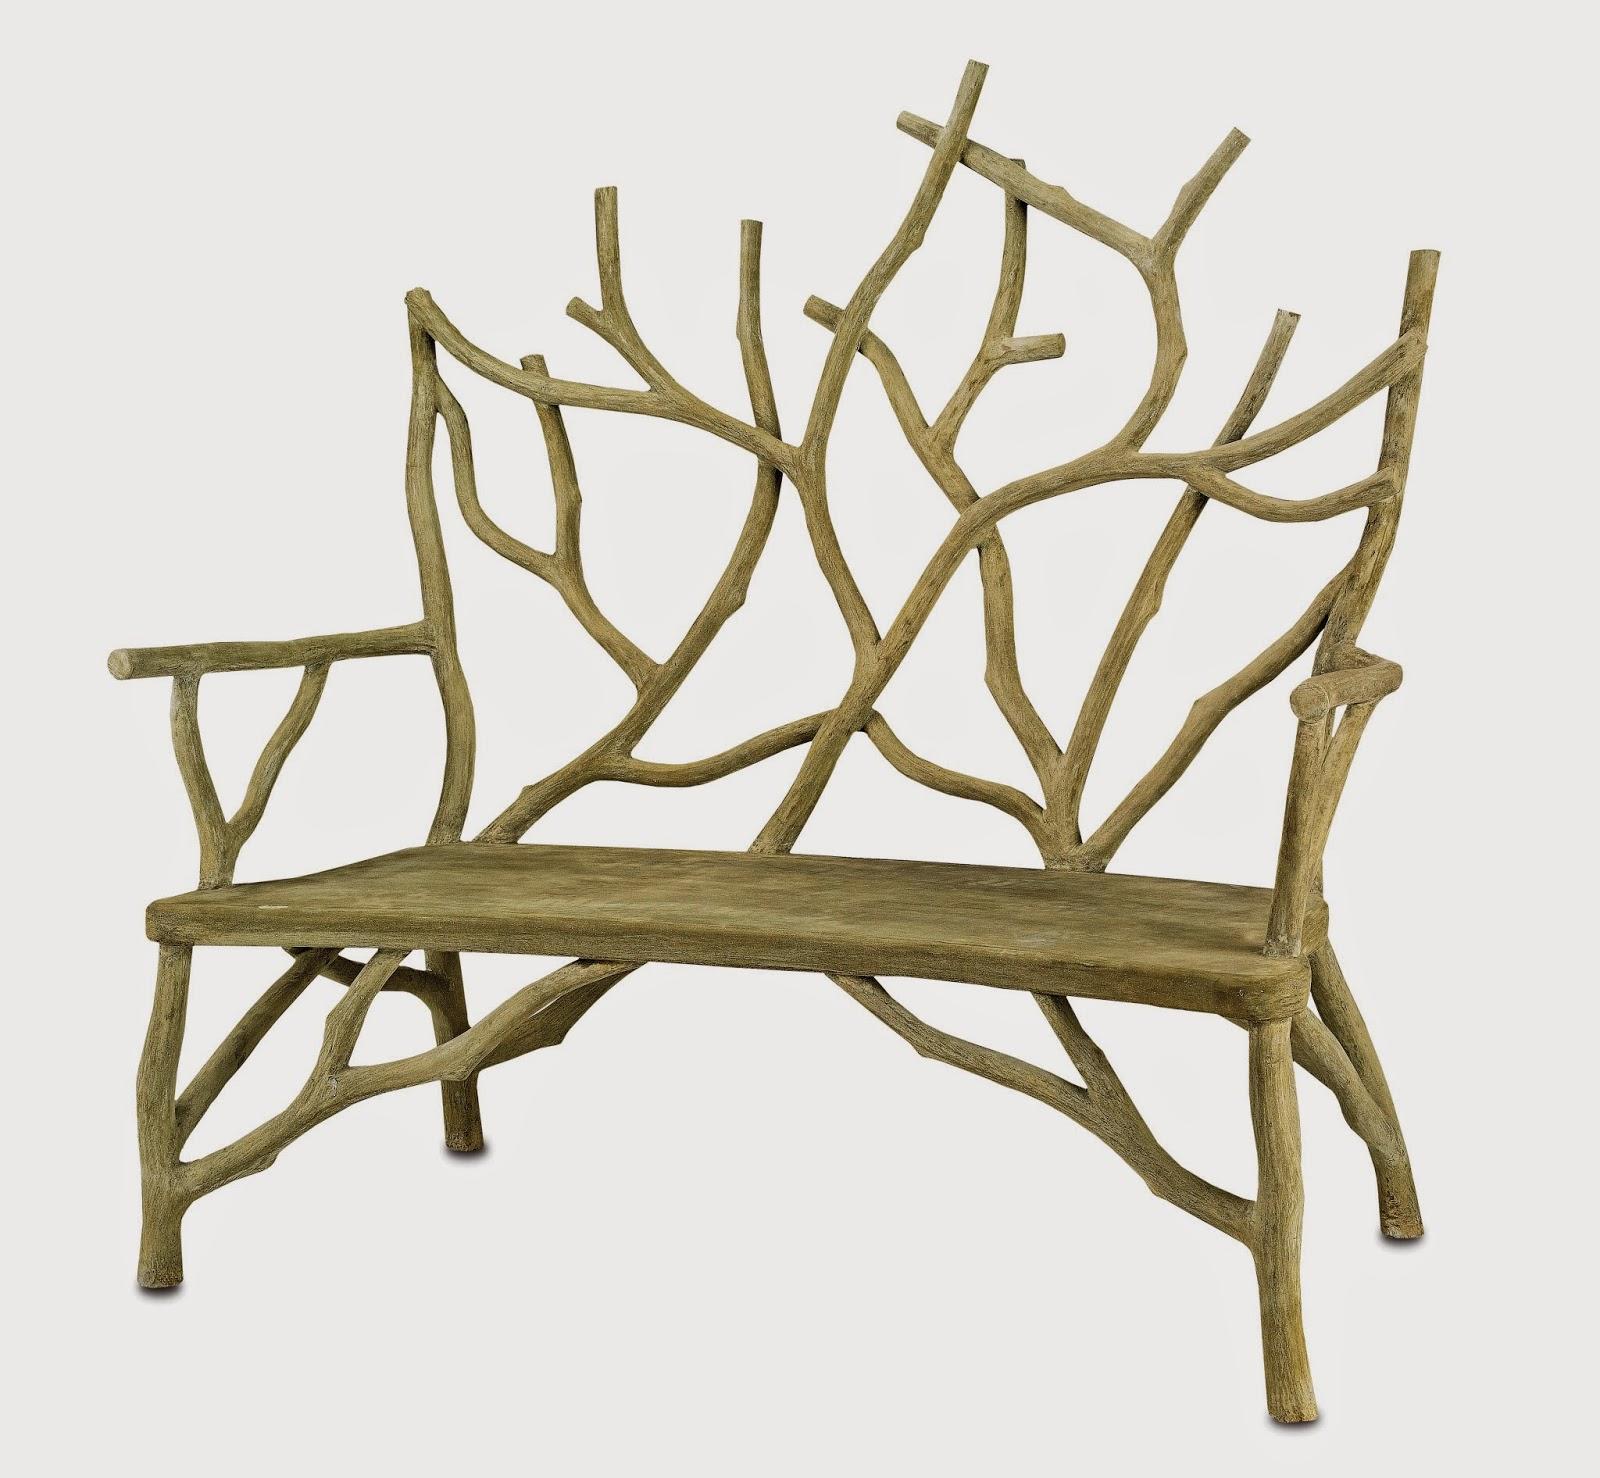 Darya Girina Interior Design: Branches and trunks in modern furniture design and interior design